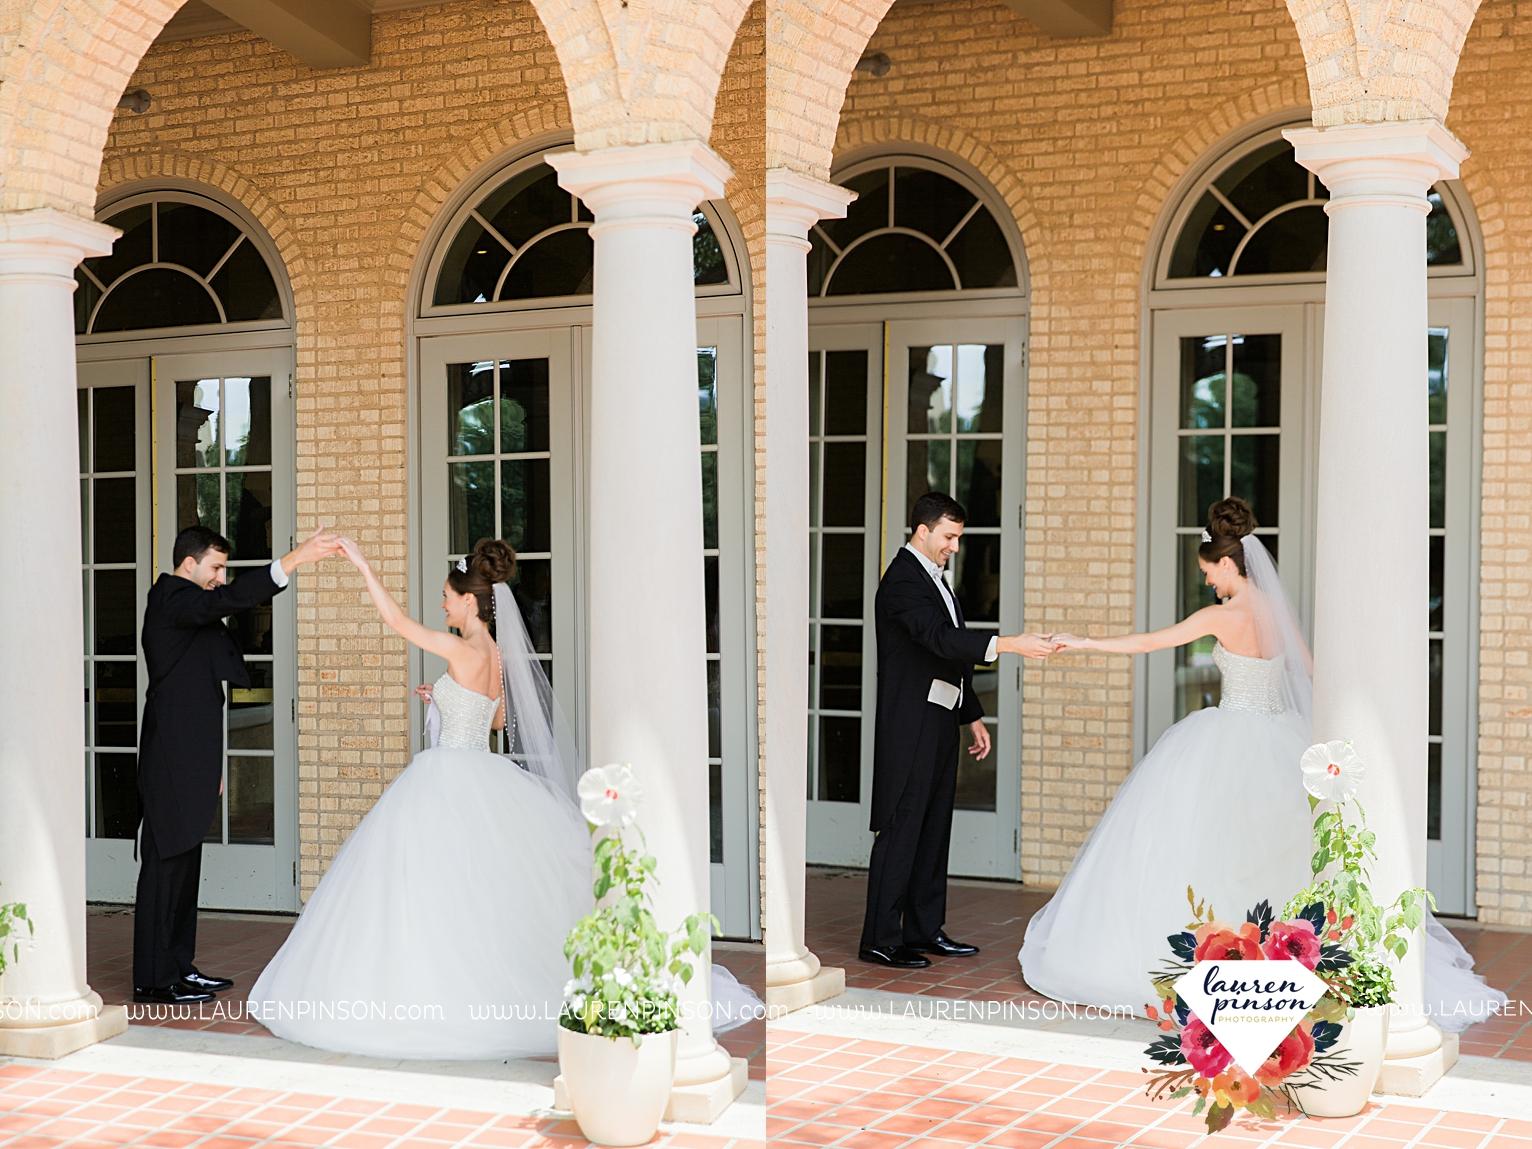 wichita-falls-texas-wedding-photographer-the-forum-by-the-kemp-mayfield-events-ulta-gold-glitter_2827.jpg